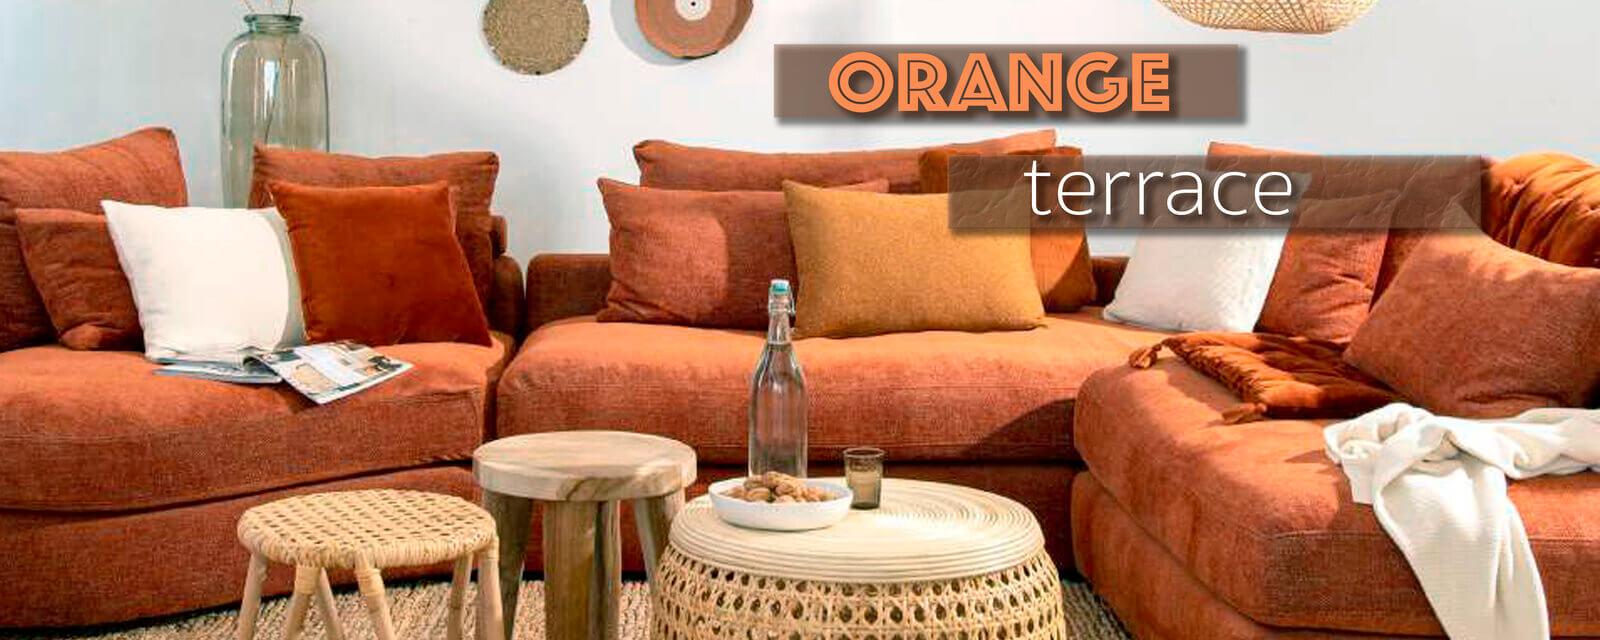 Orange | Terrace